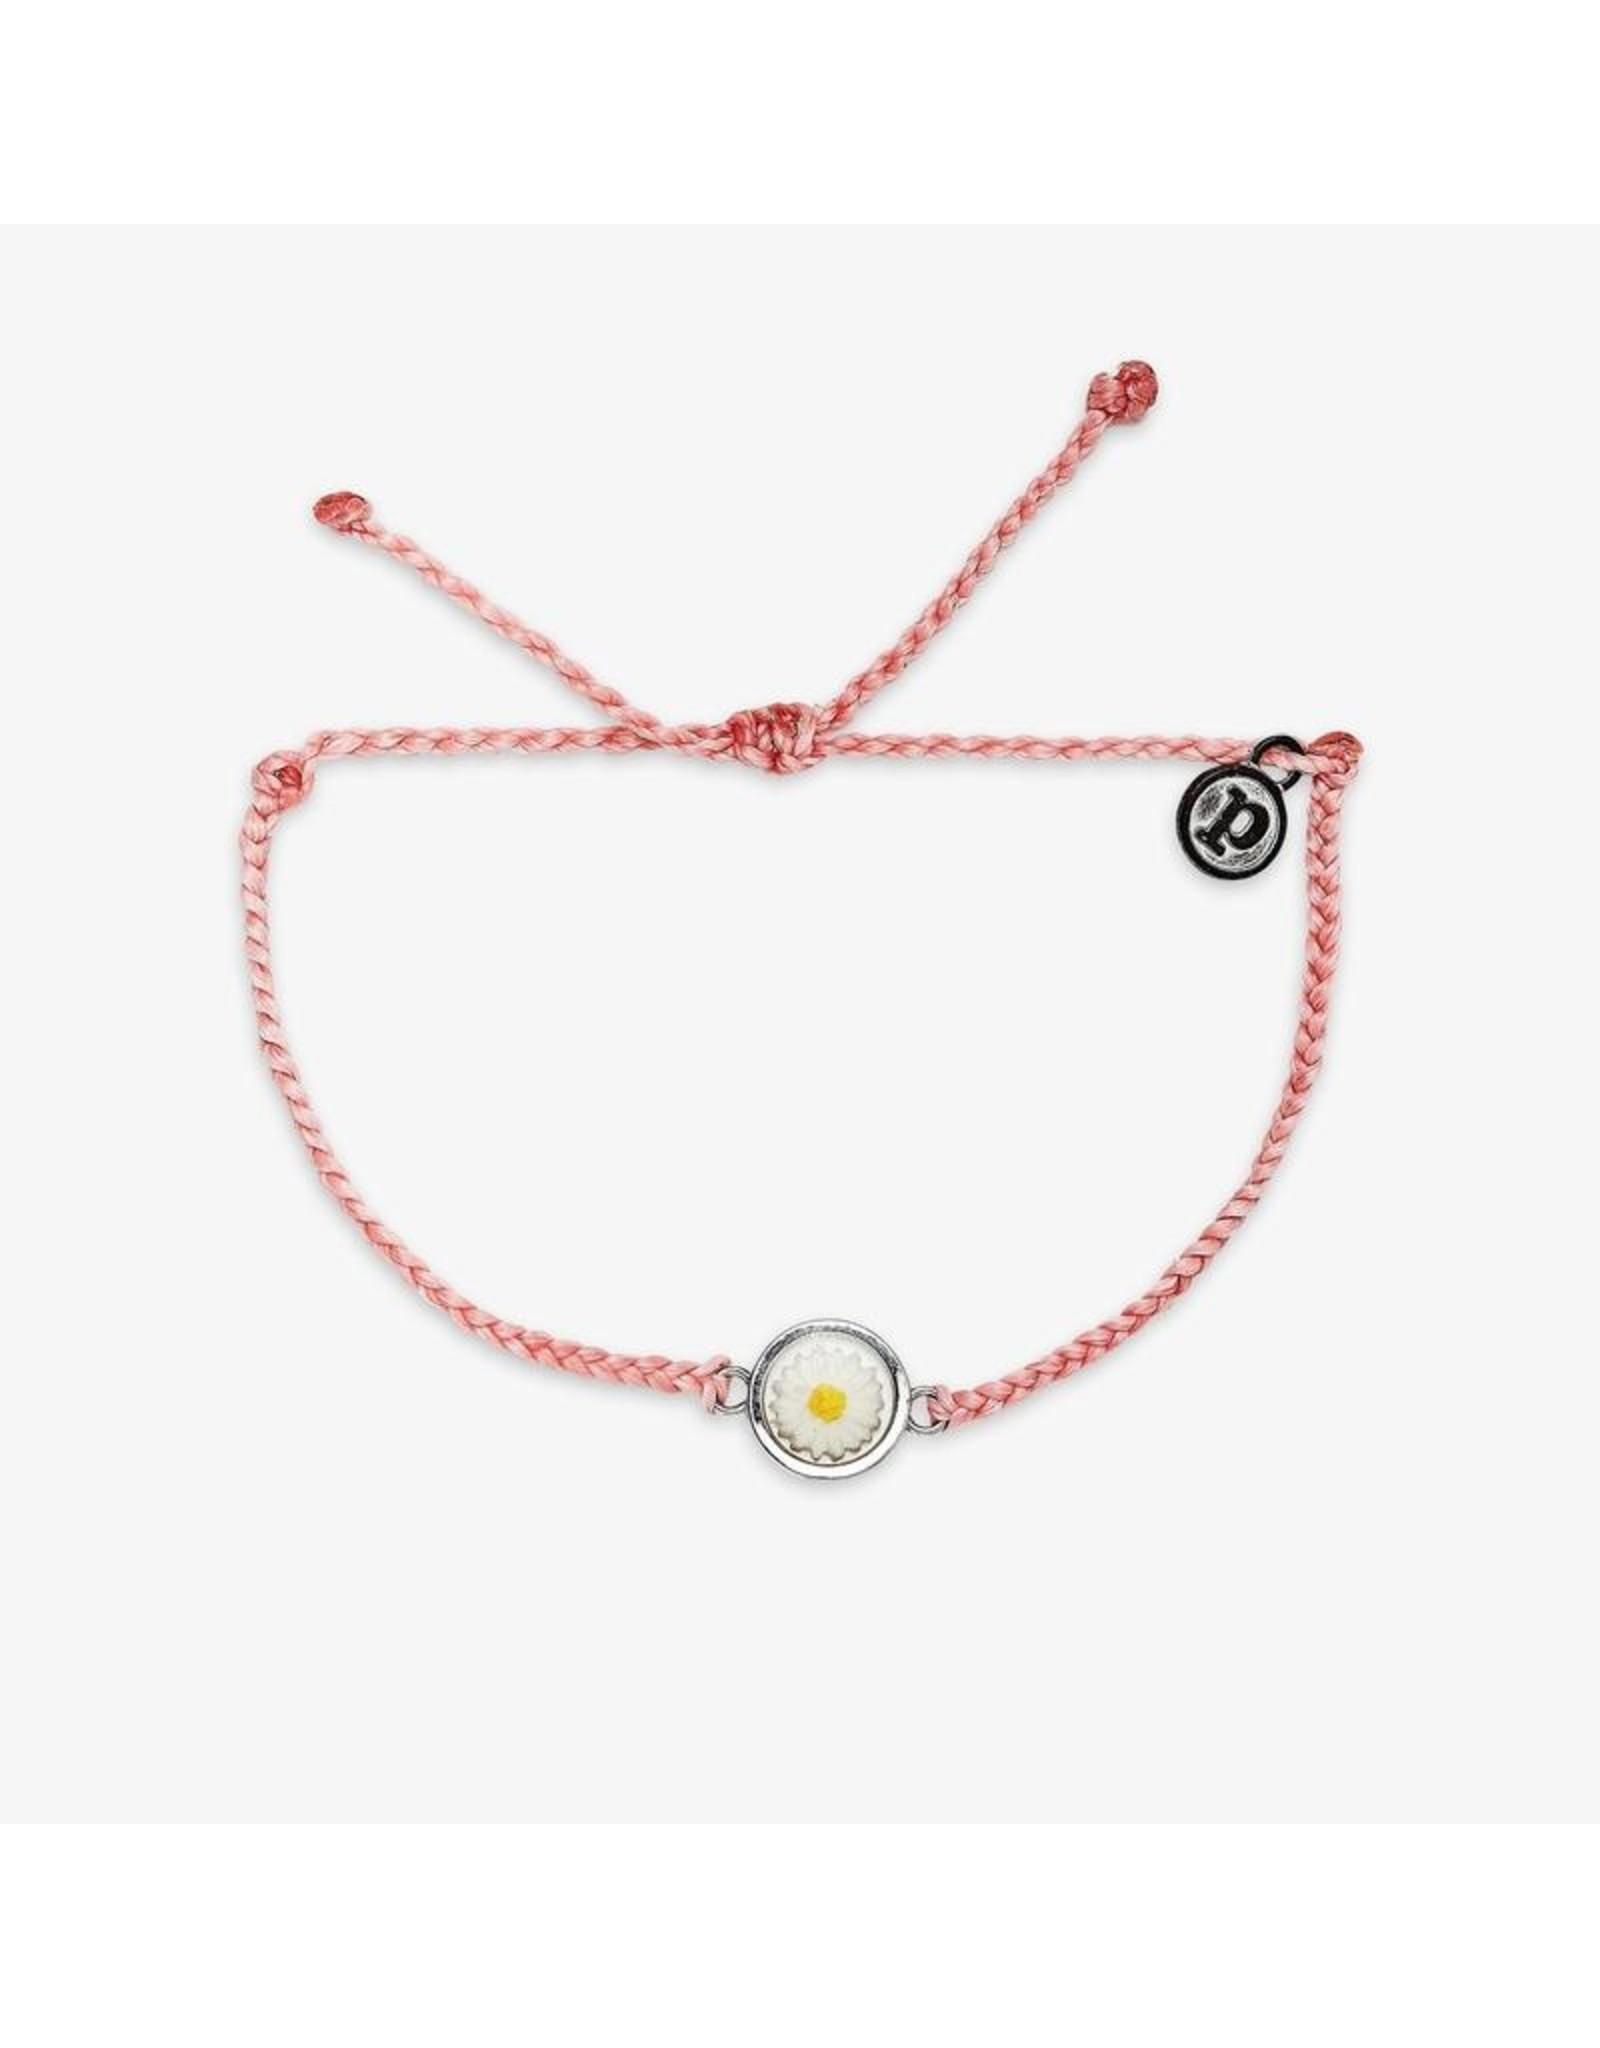 Pura Vida Meadow Silver Bracelet, Parfait Pink